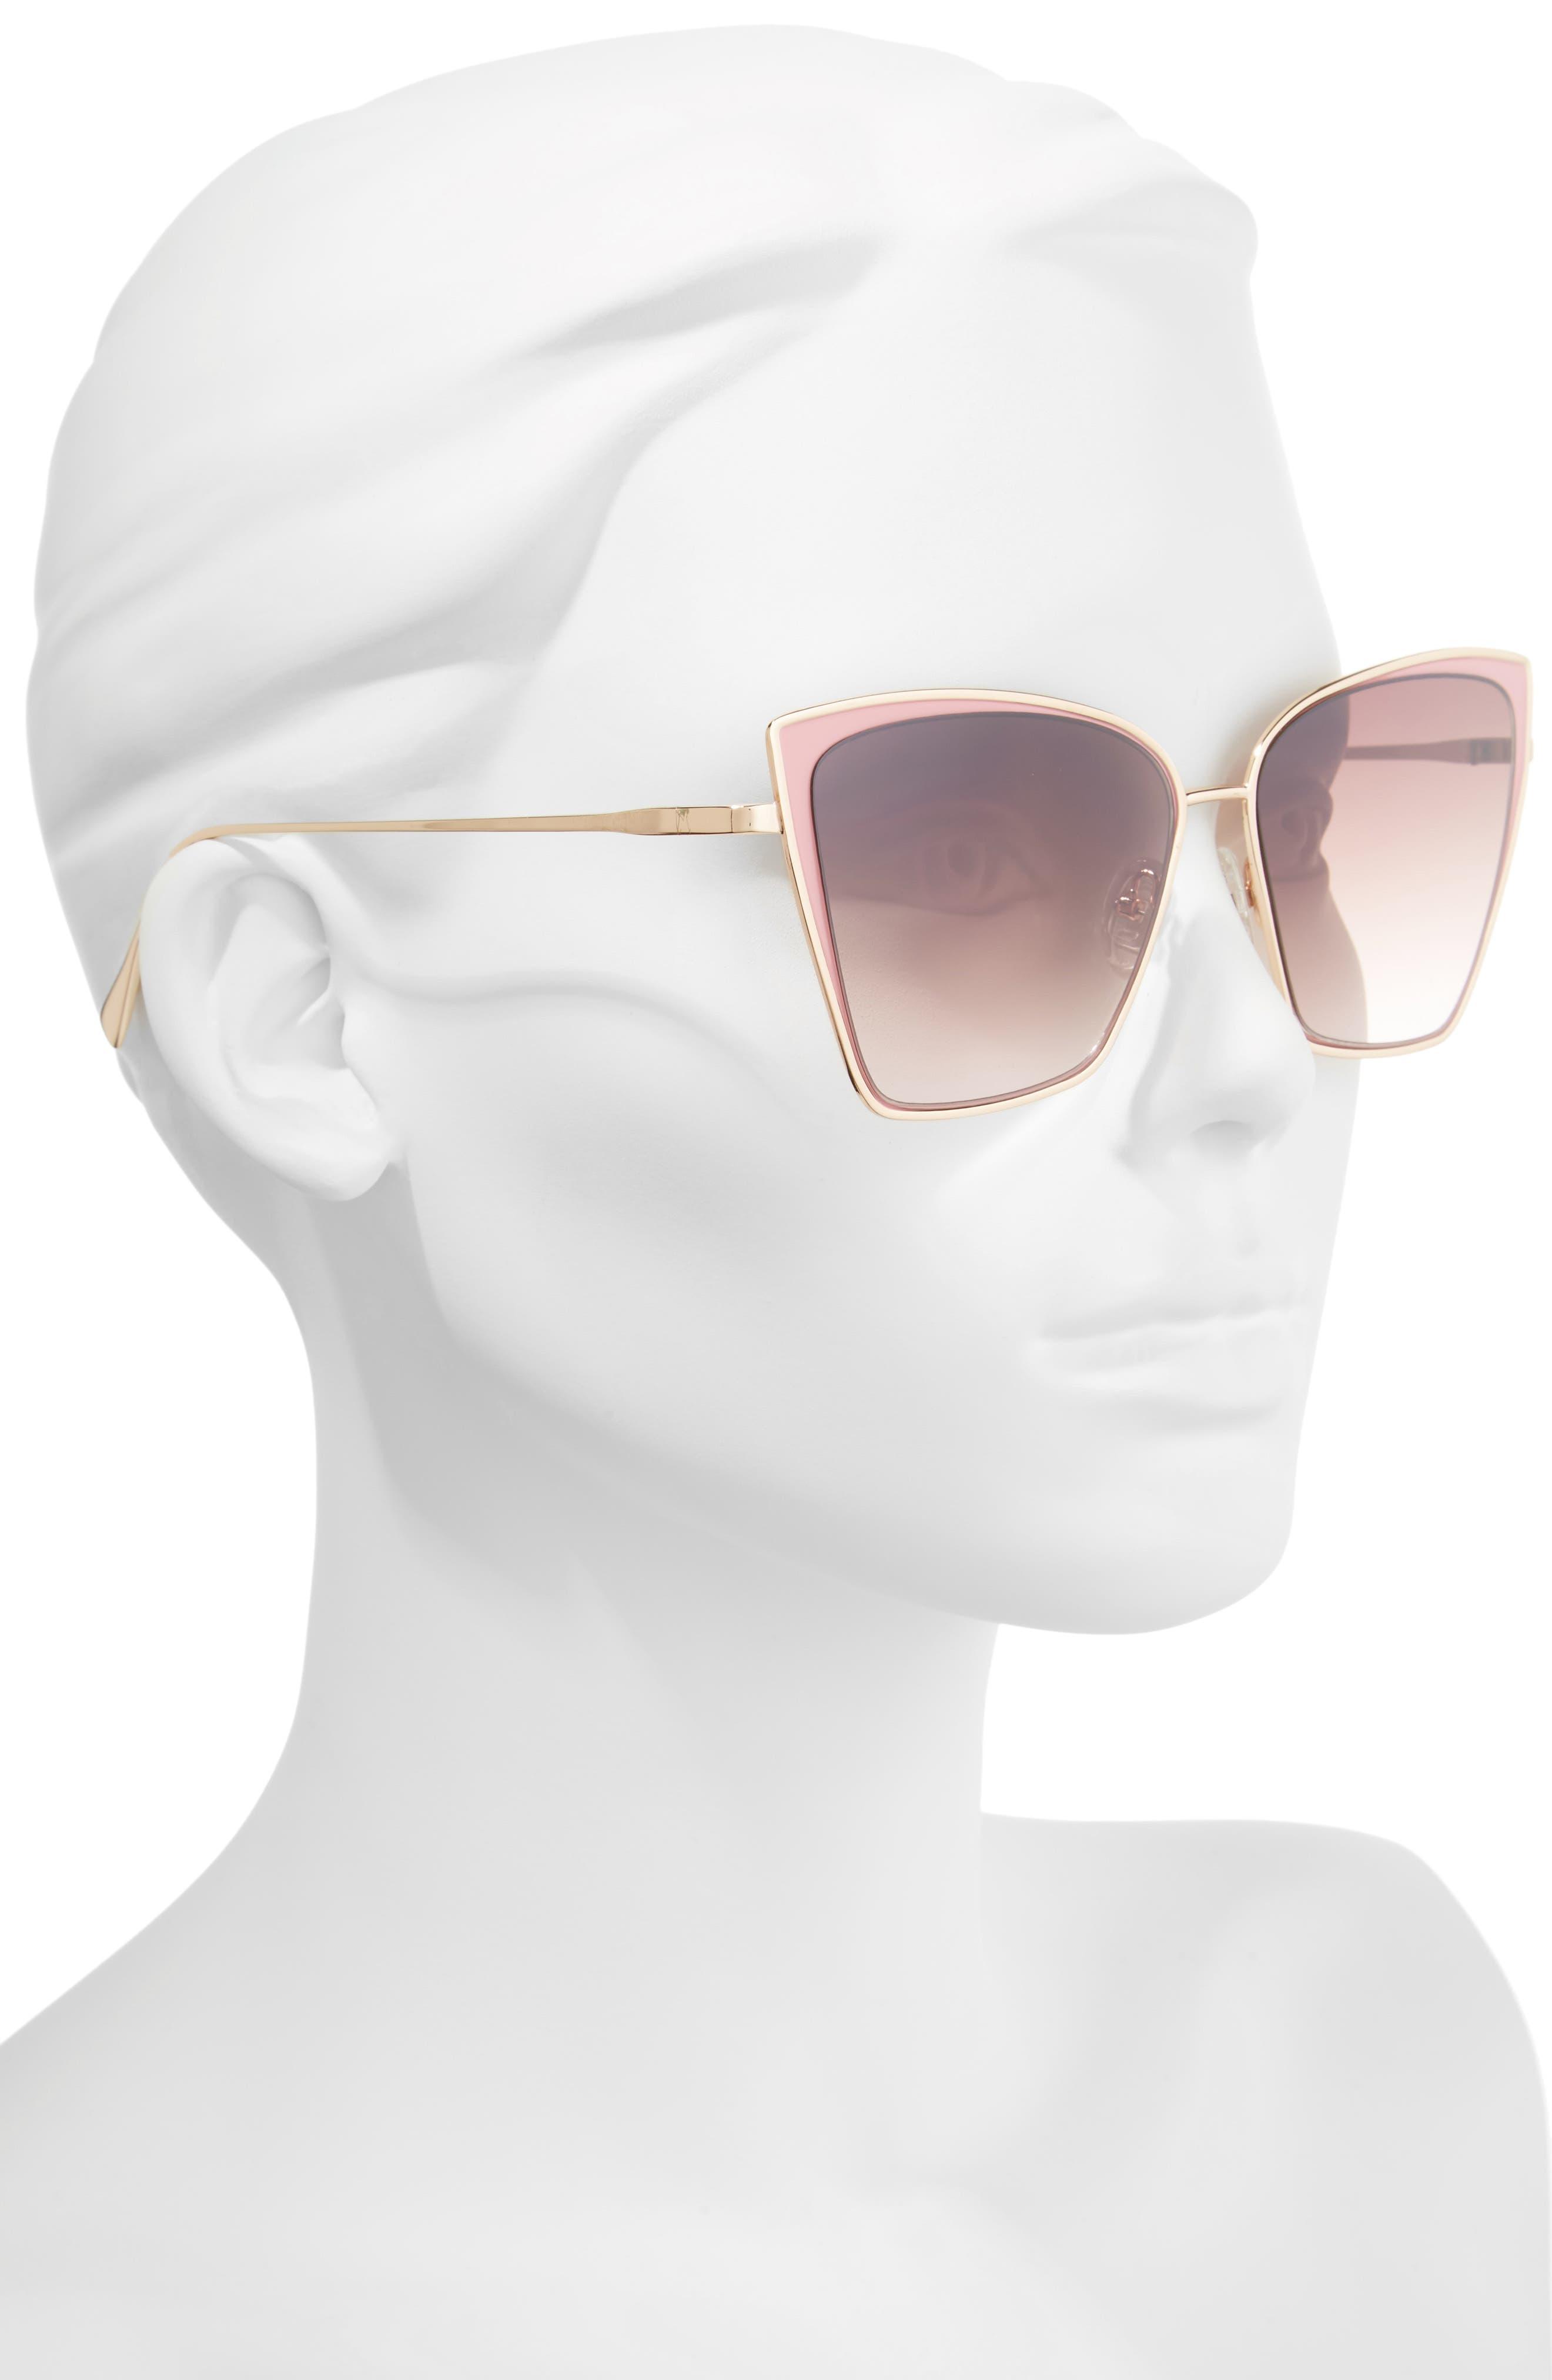 Pinkaboo 58mm Sunglasses,                             Alternate thumbnail 2, color,                             650